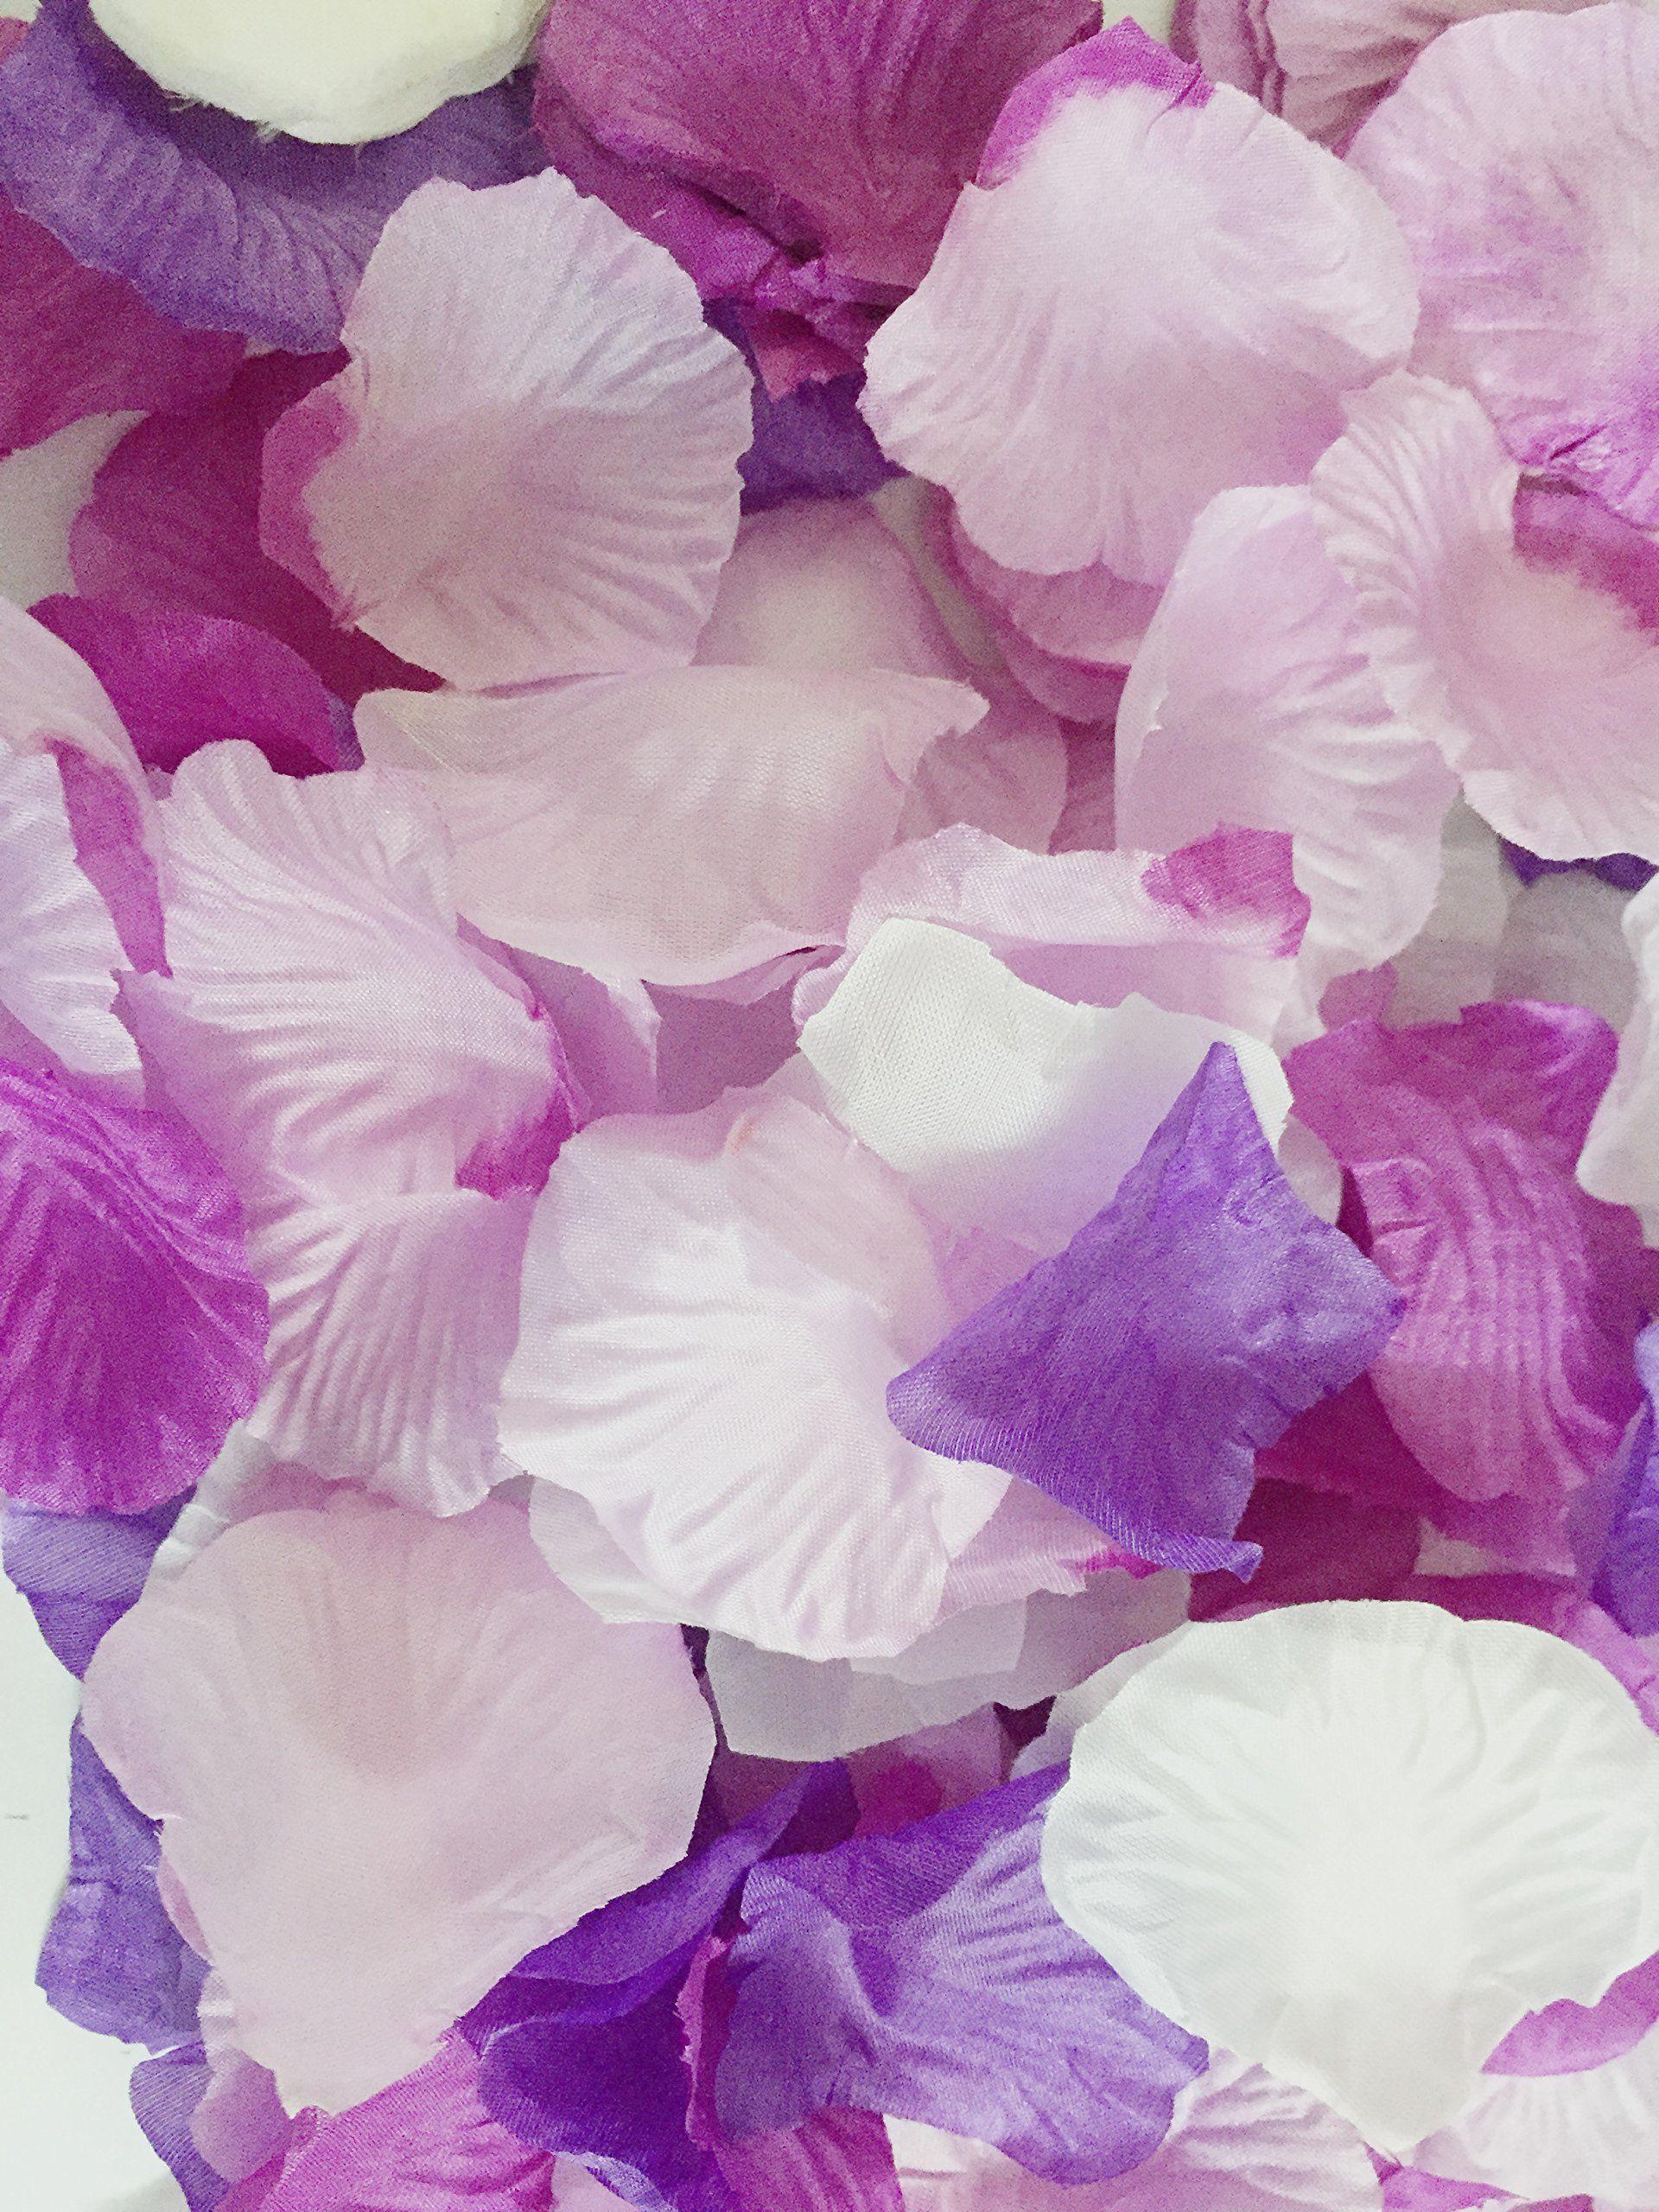 Robot Check Rose Petals Wedding Flower Petals Wedding Silk Rose Petals